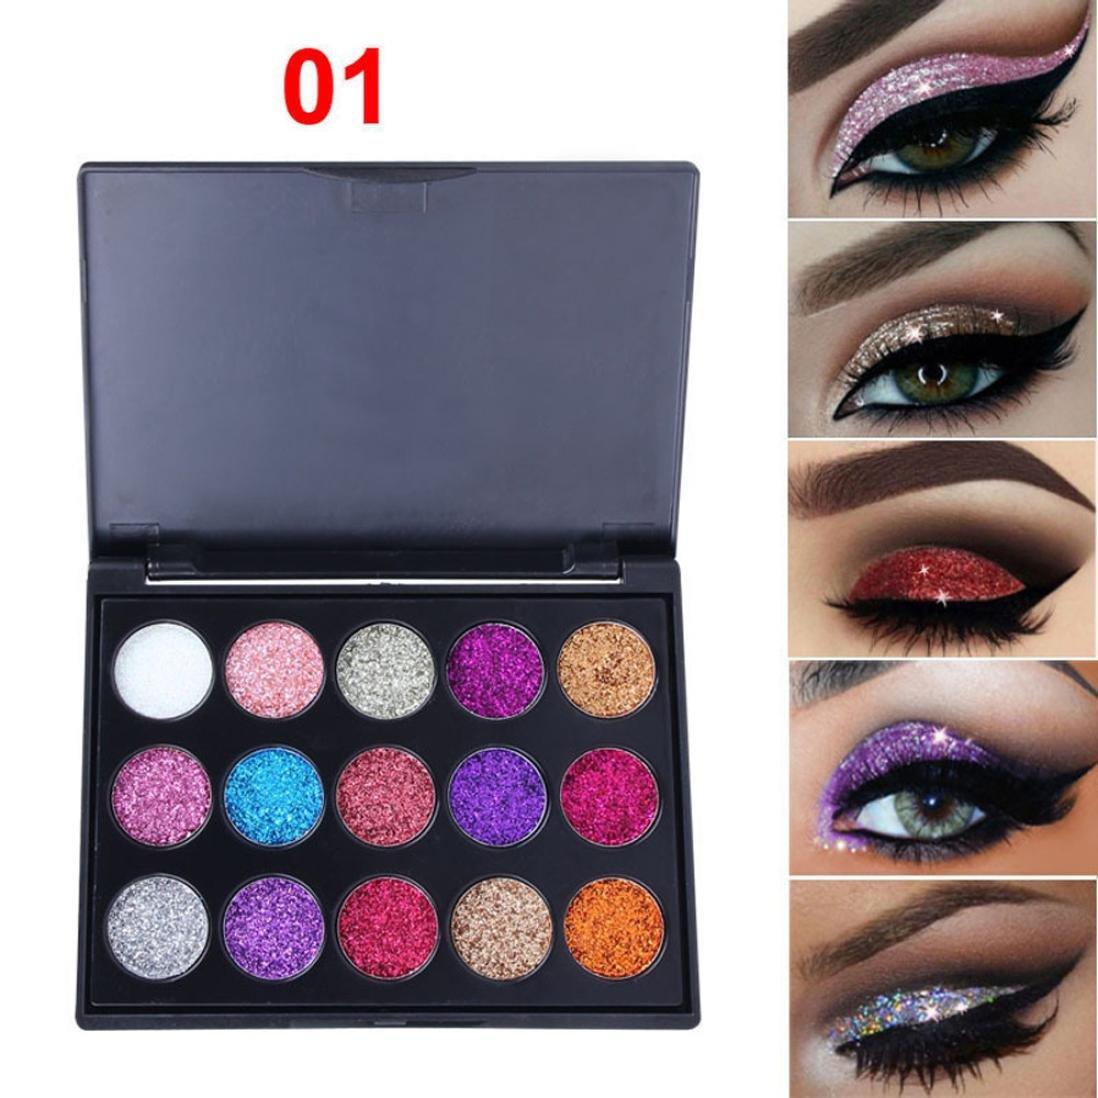 Gaddrt Eye Shadow Palettes 15 Colors Shimmer Glitter Powder Palette Matte Eyeshadow Cosmetic Makeup 10cmx7.8cmx1cm (B)